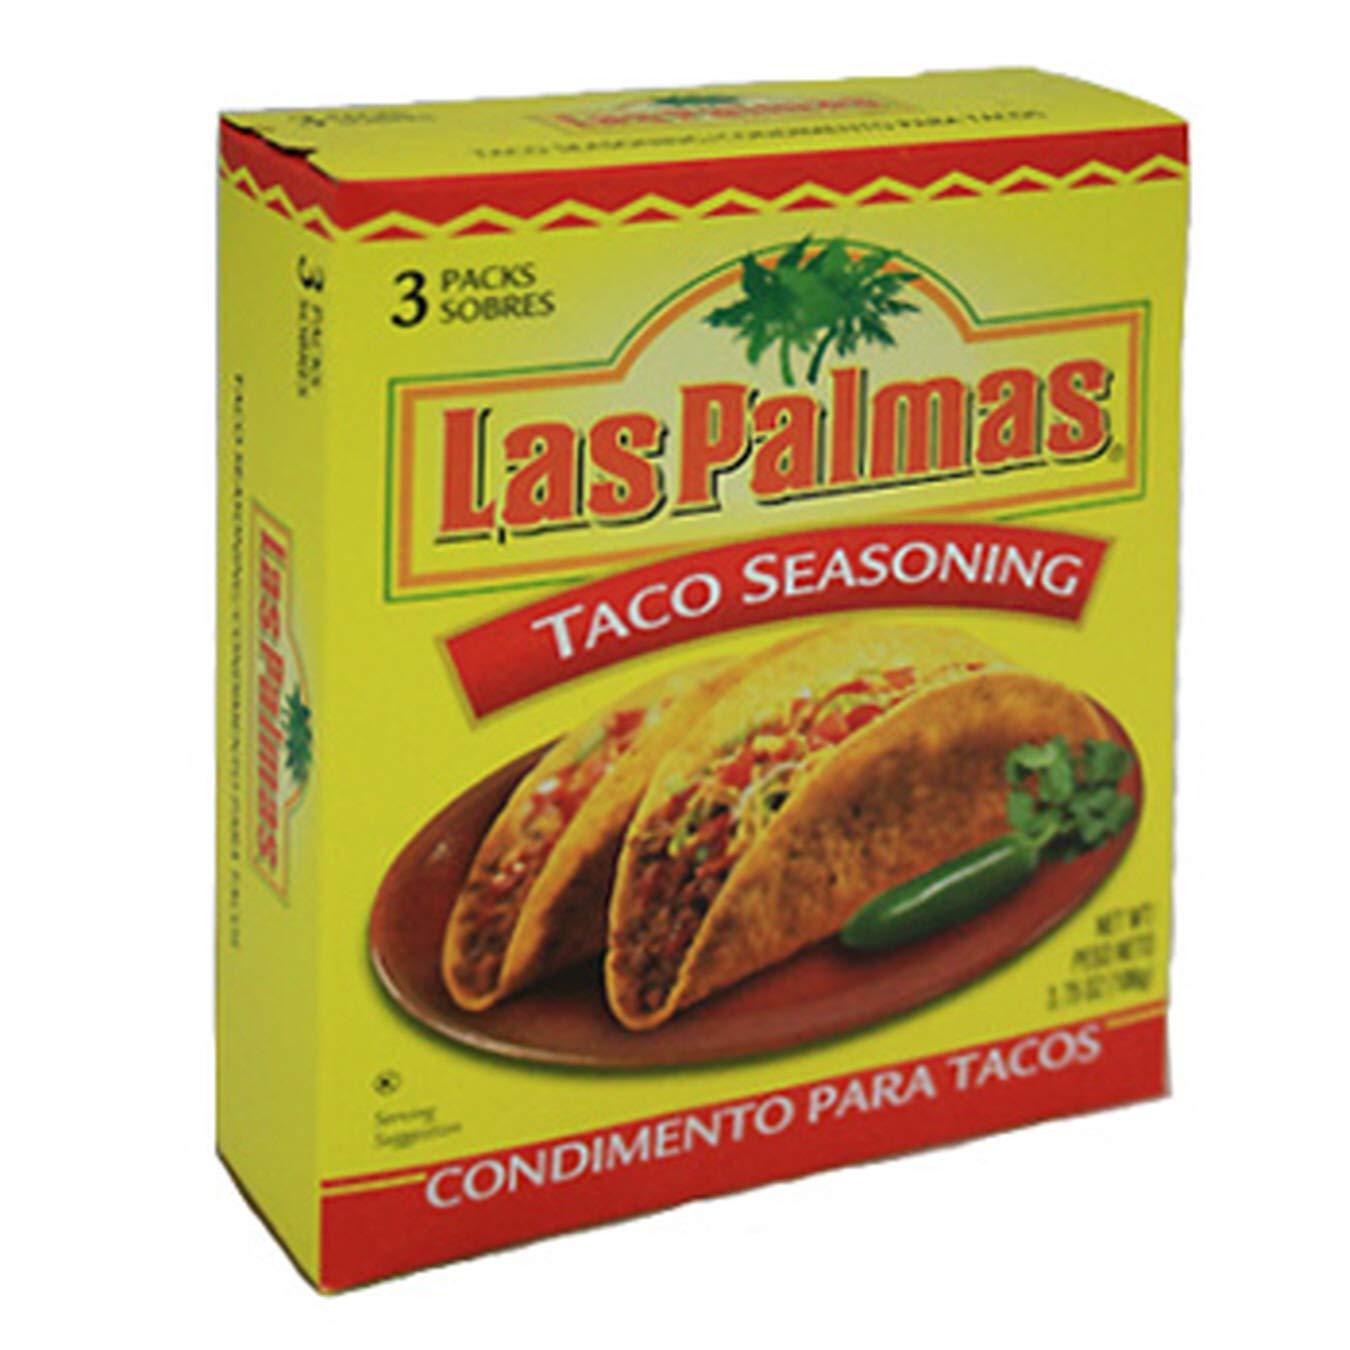 (Pack of 12, 36 Ct) Las Palmas Taco Seasoning